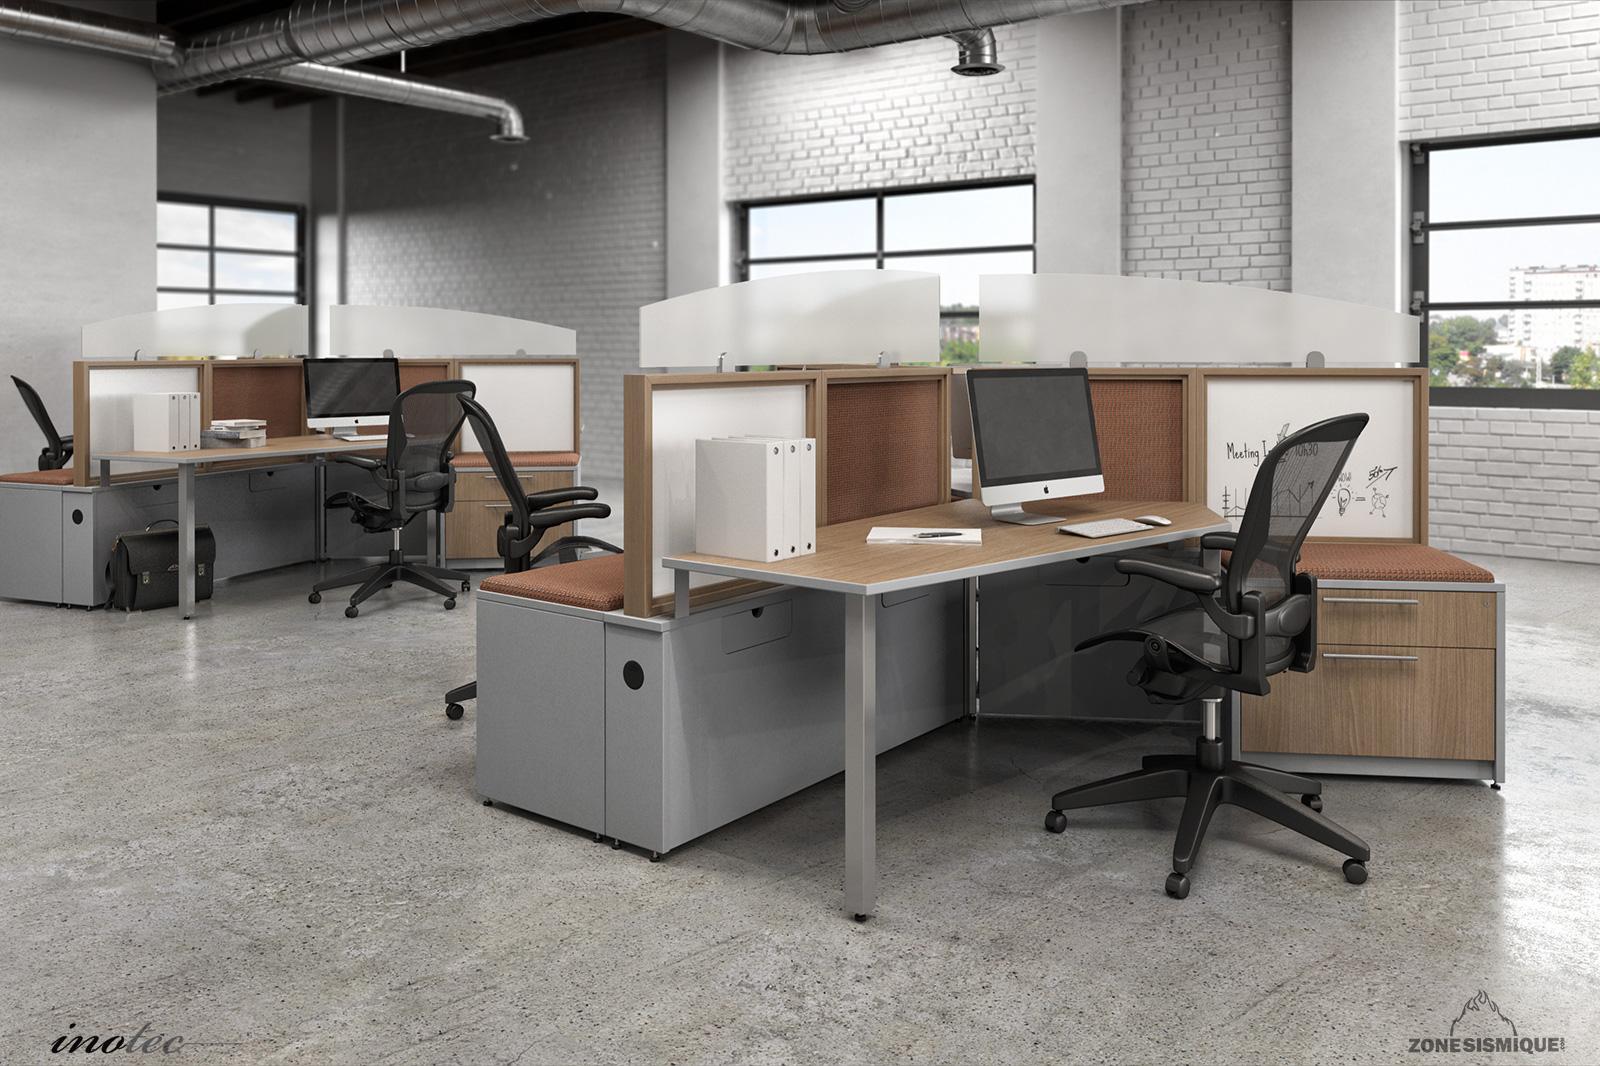 zone sismique inotec scene bureau 3d ypc 606 v1 zone sismique design industriel 3d. Black Bedroom Furniture Sets. Home Design Ideas